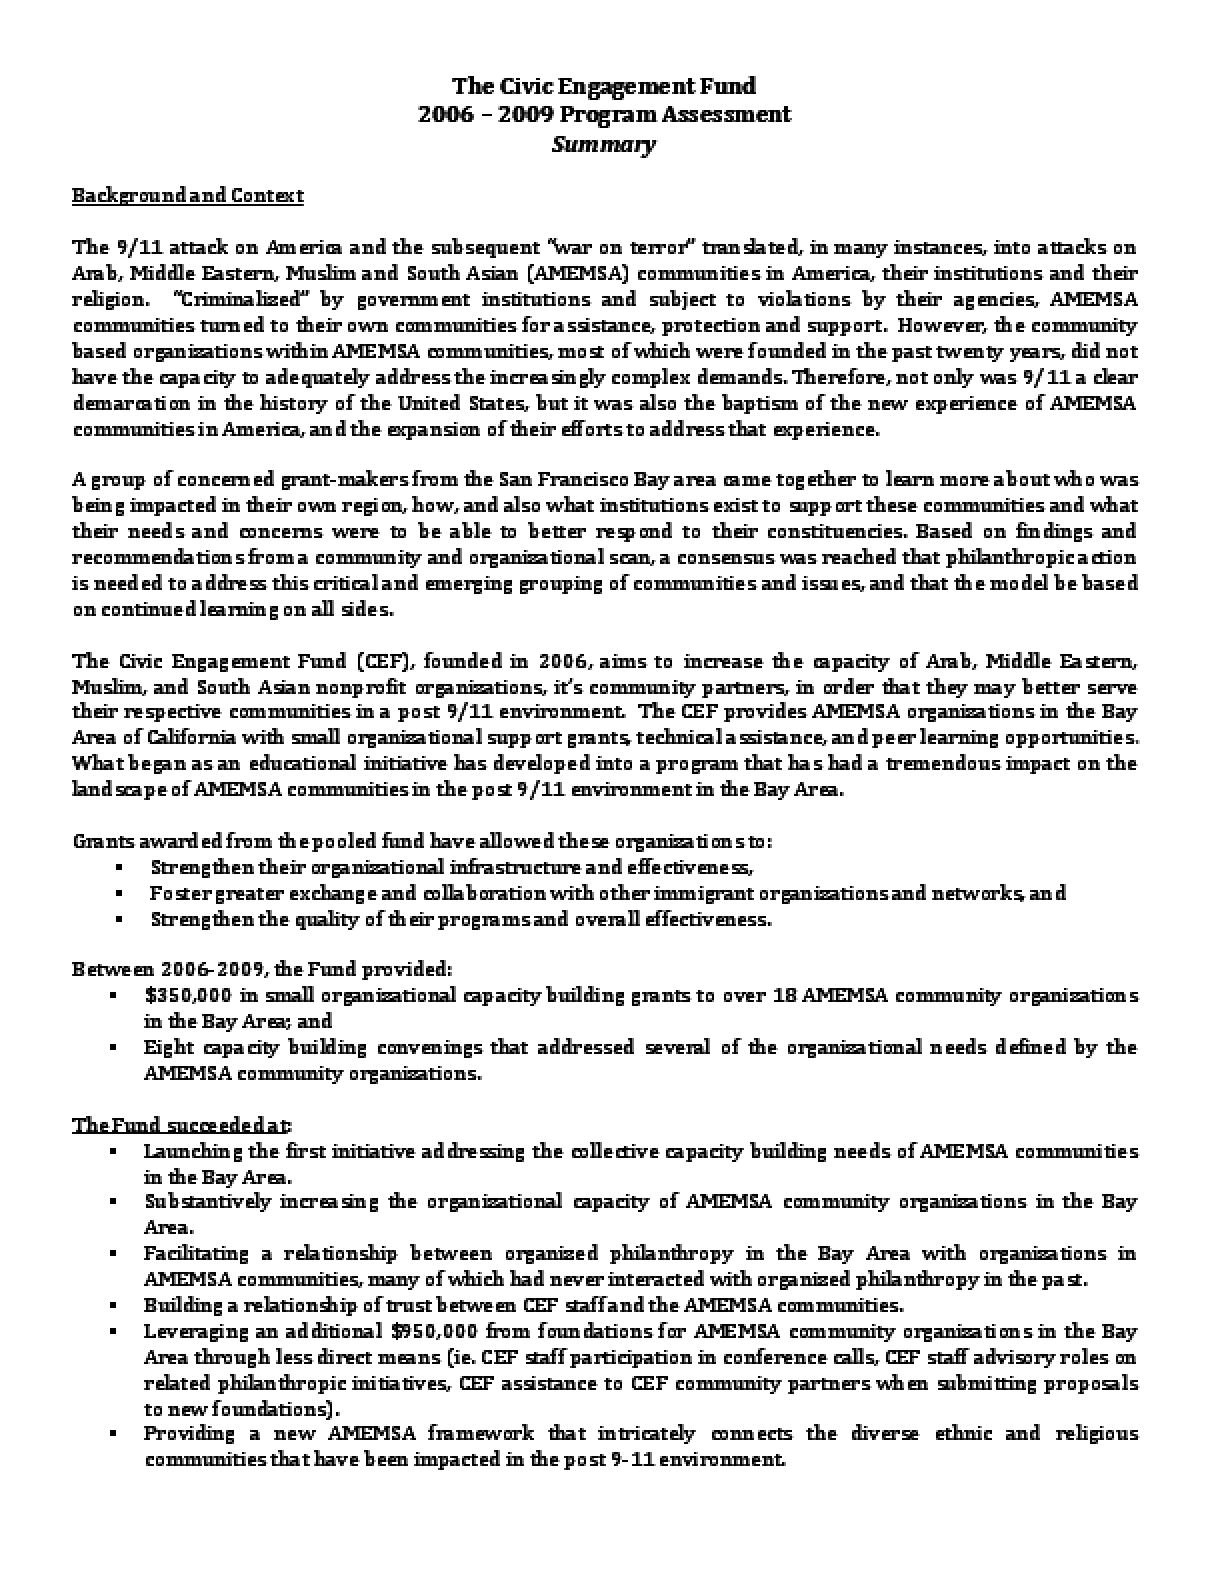 The Civic Engagement Fund 2006-2009 Program Assessment Summary